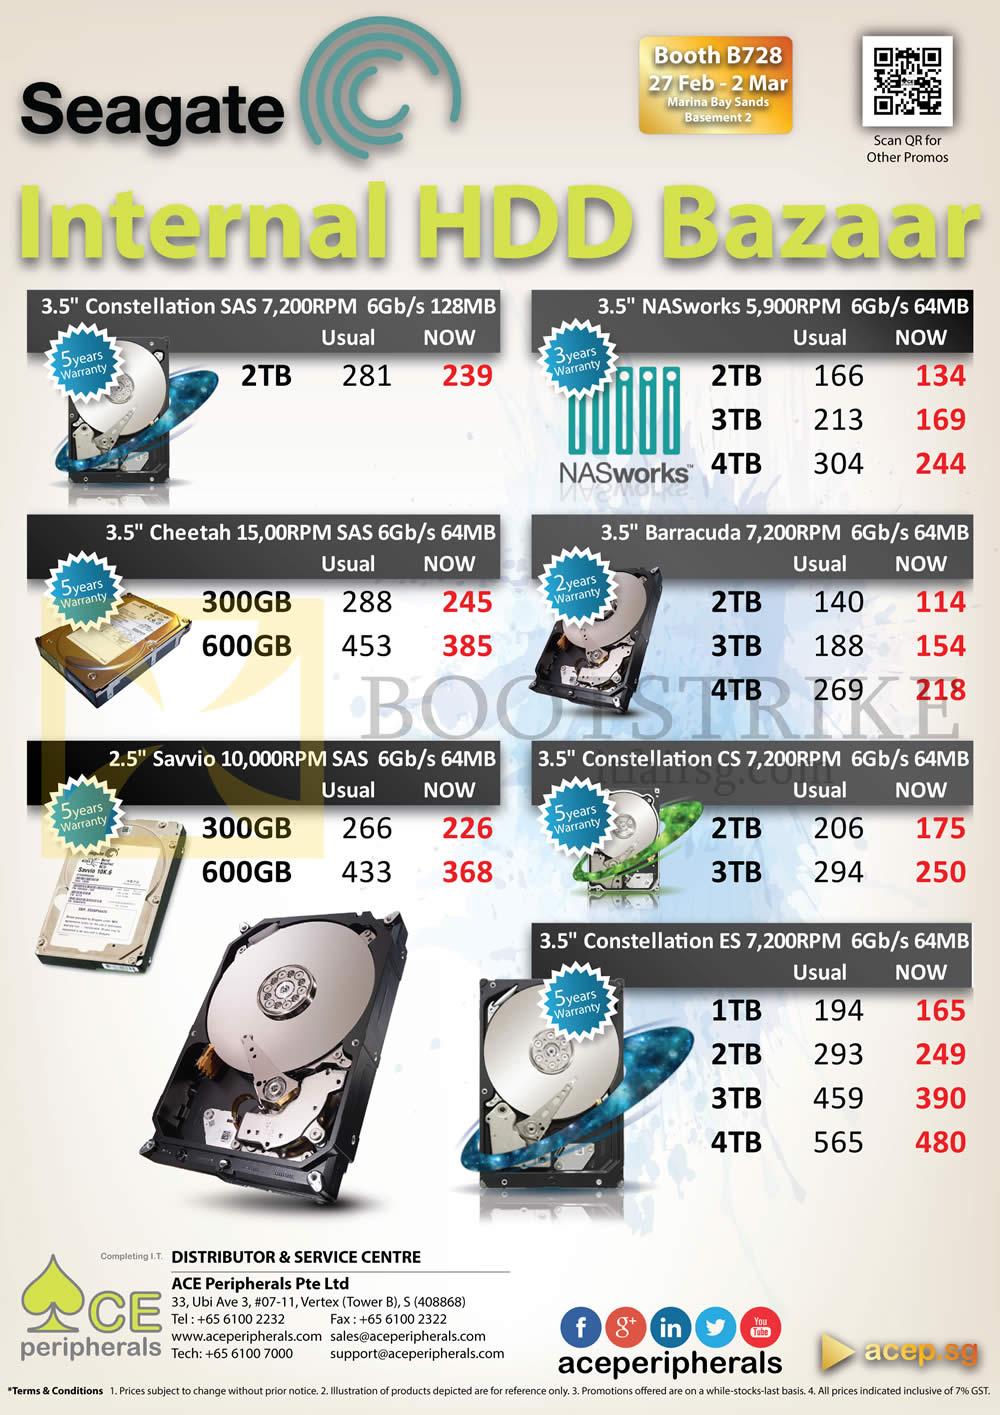 Ace Peripherals Seagate Internal HDD HardDisk Barracuda NASworks 1TB